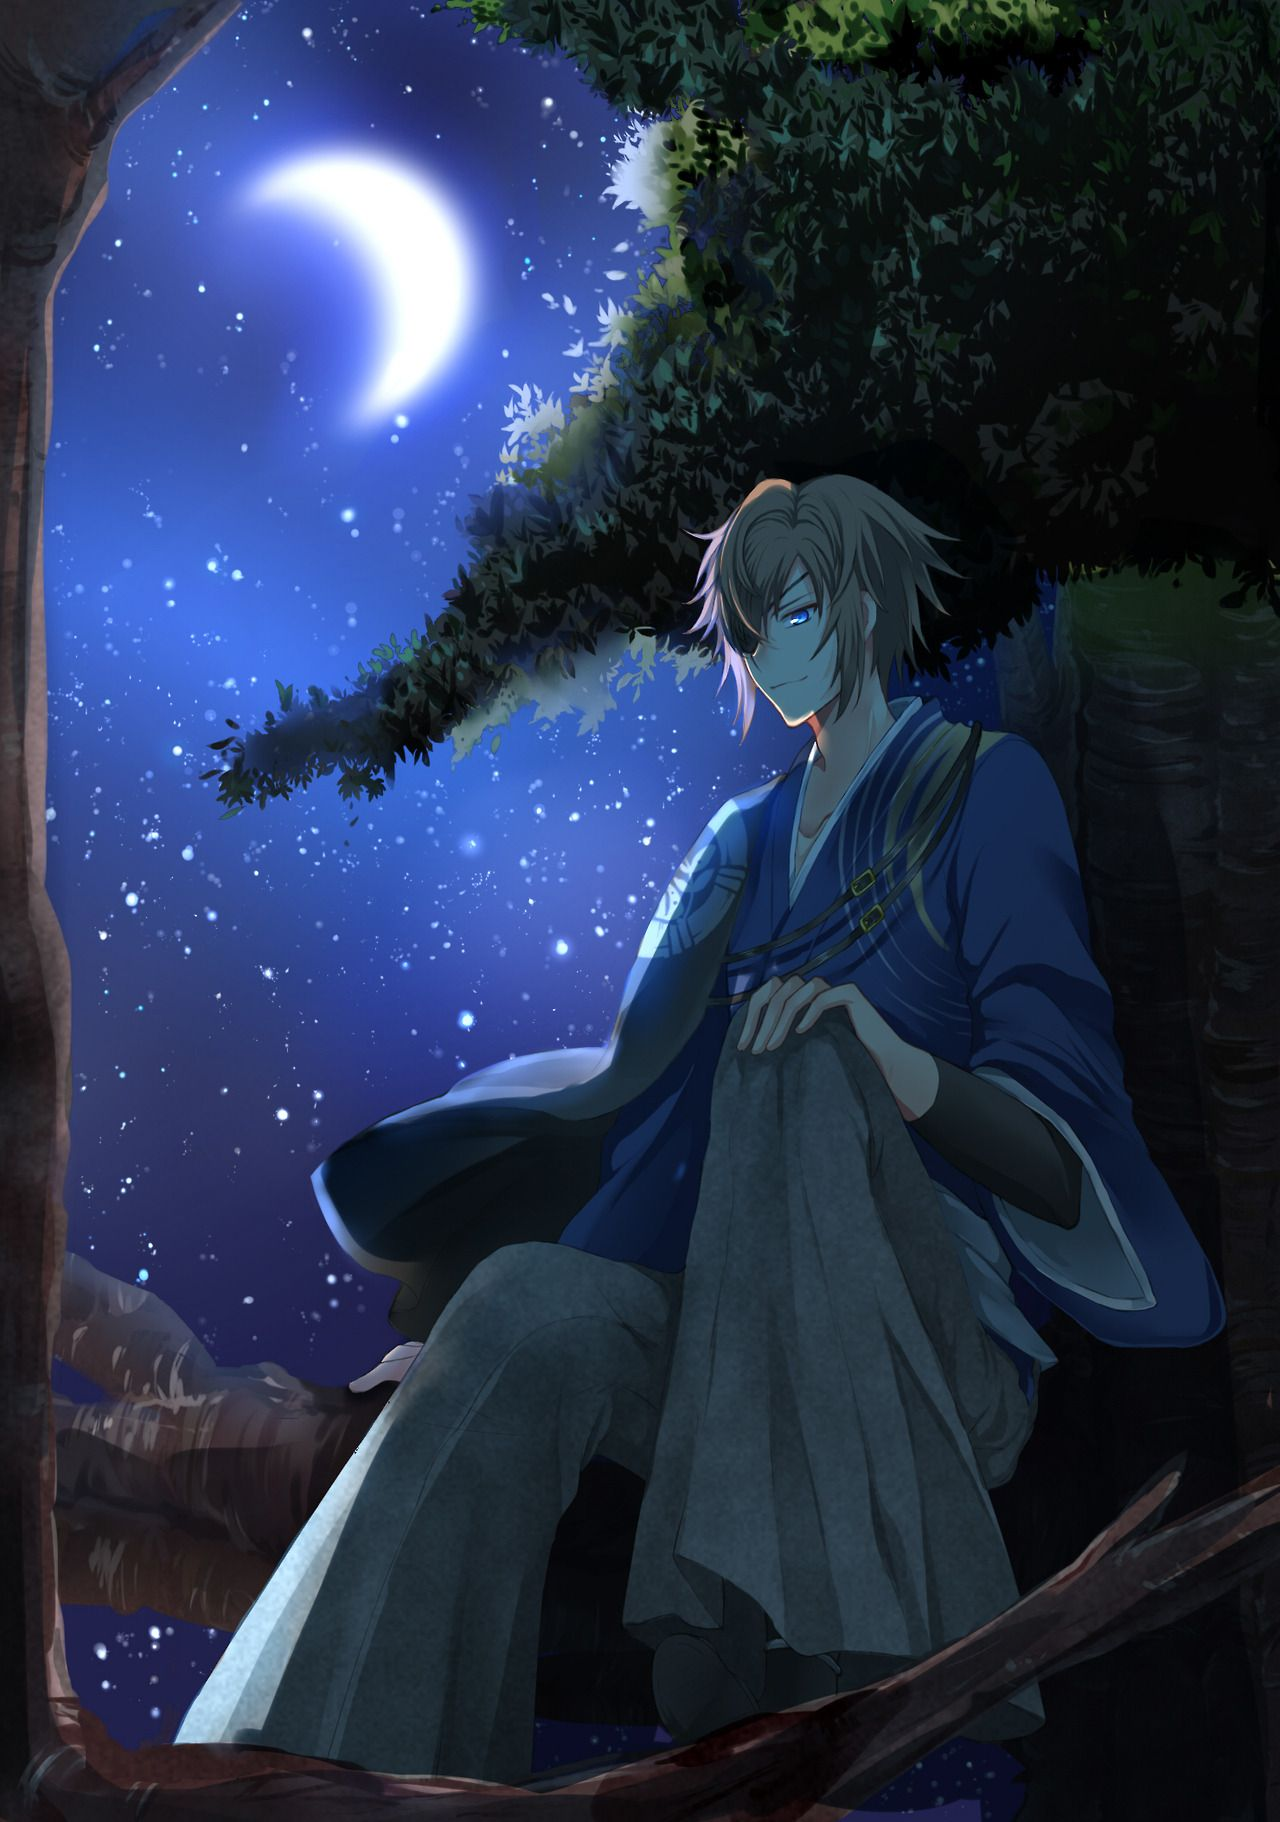 Ikemen sengoku masamune anime inspired cool anime guys